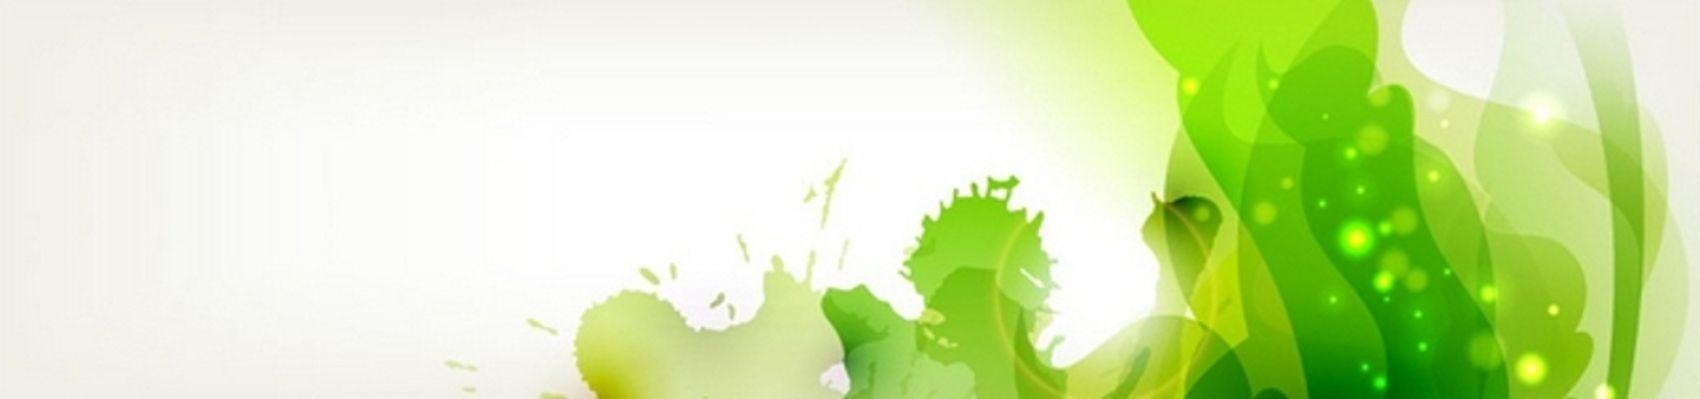 зеленые разводы краски